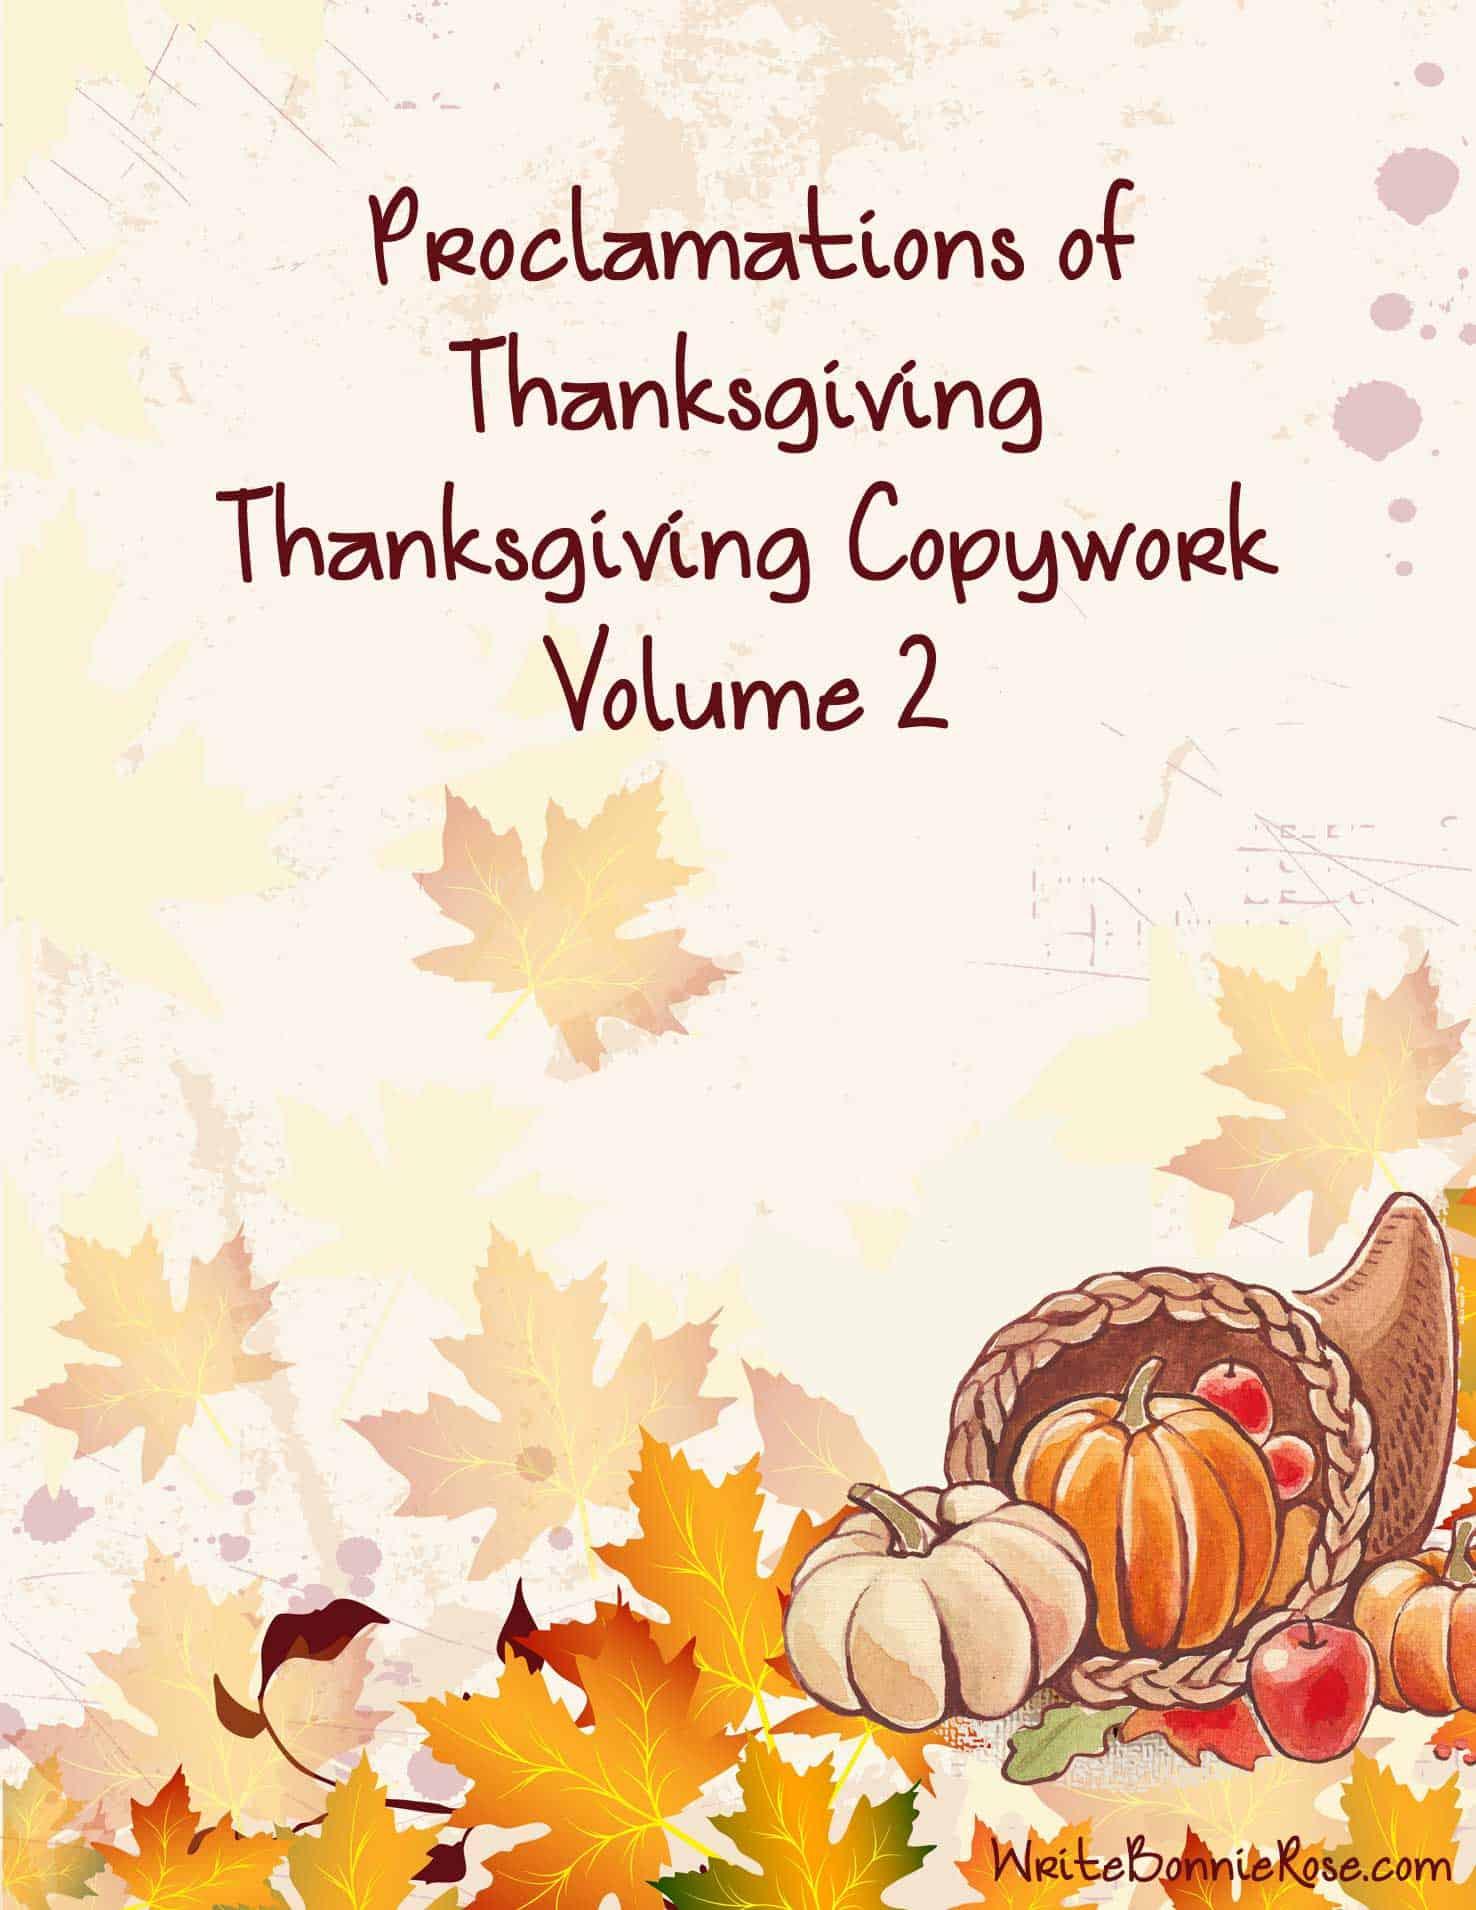 Free Thanksgiving Copywork Volume 2